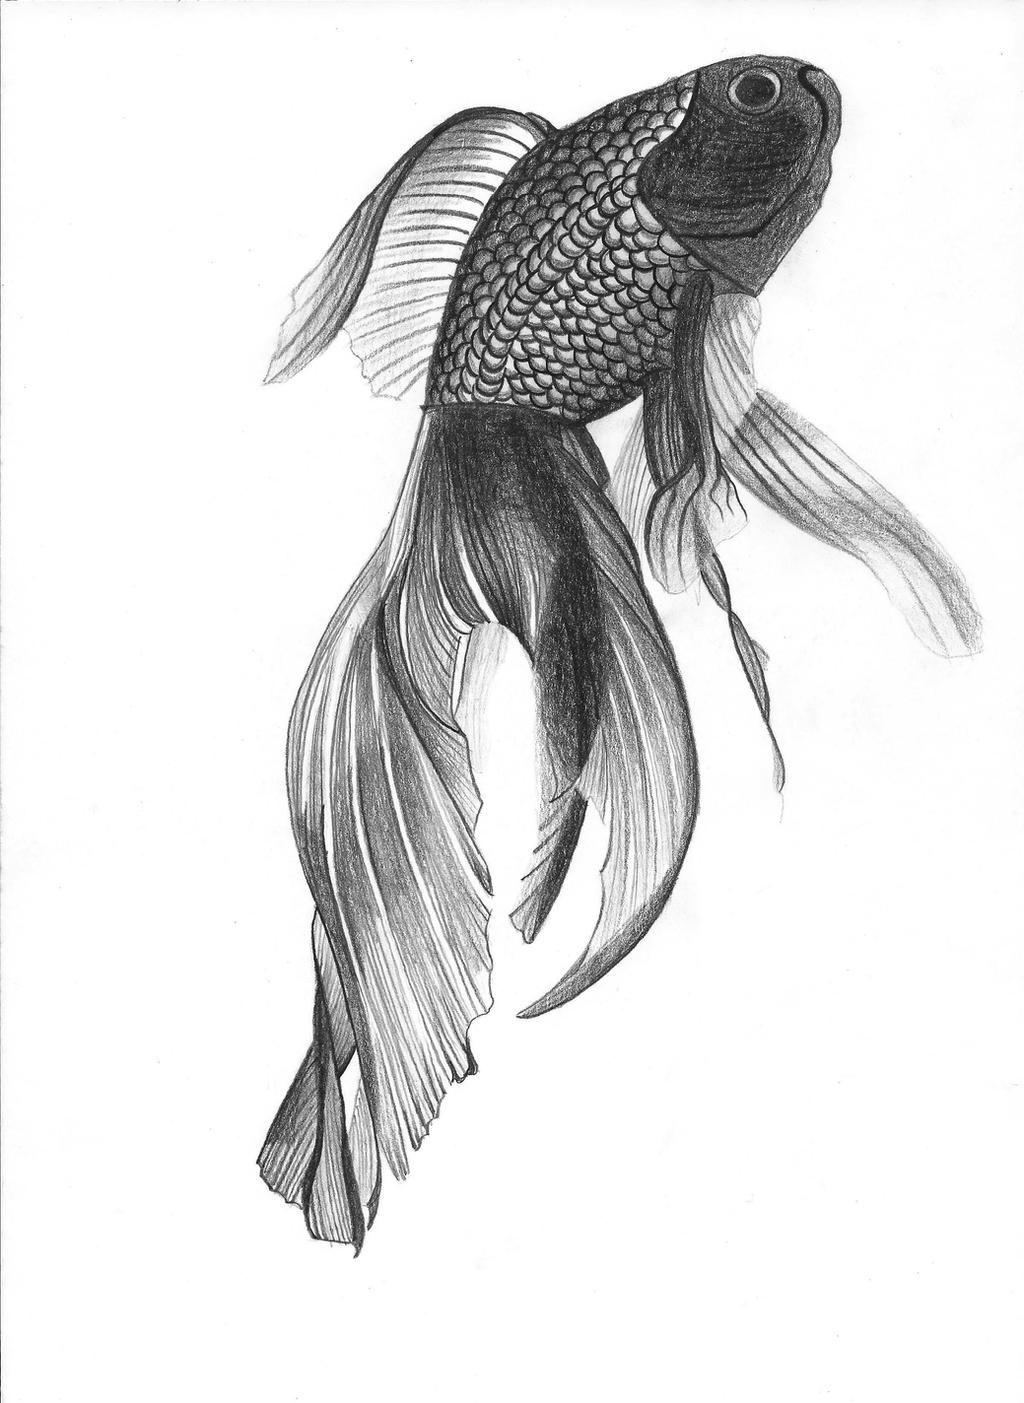 Angel fish drawings - photo#6